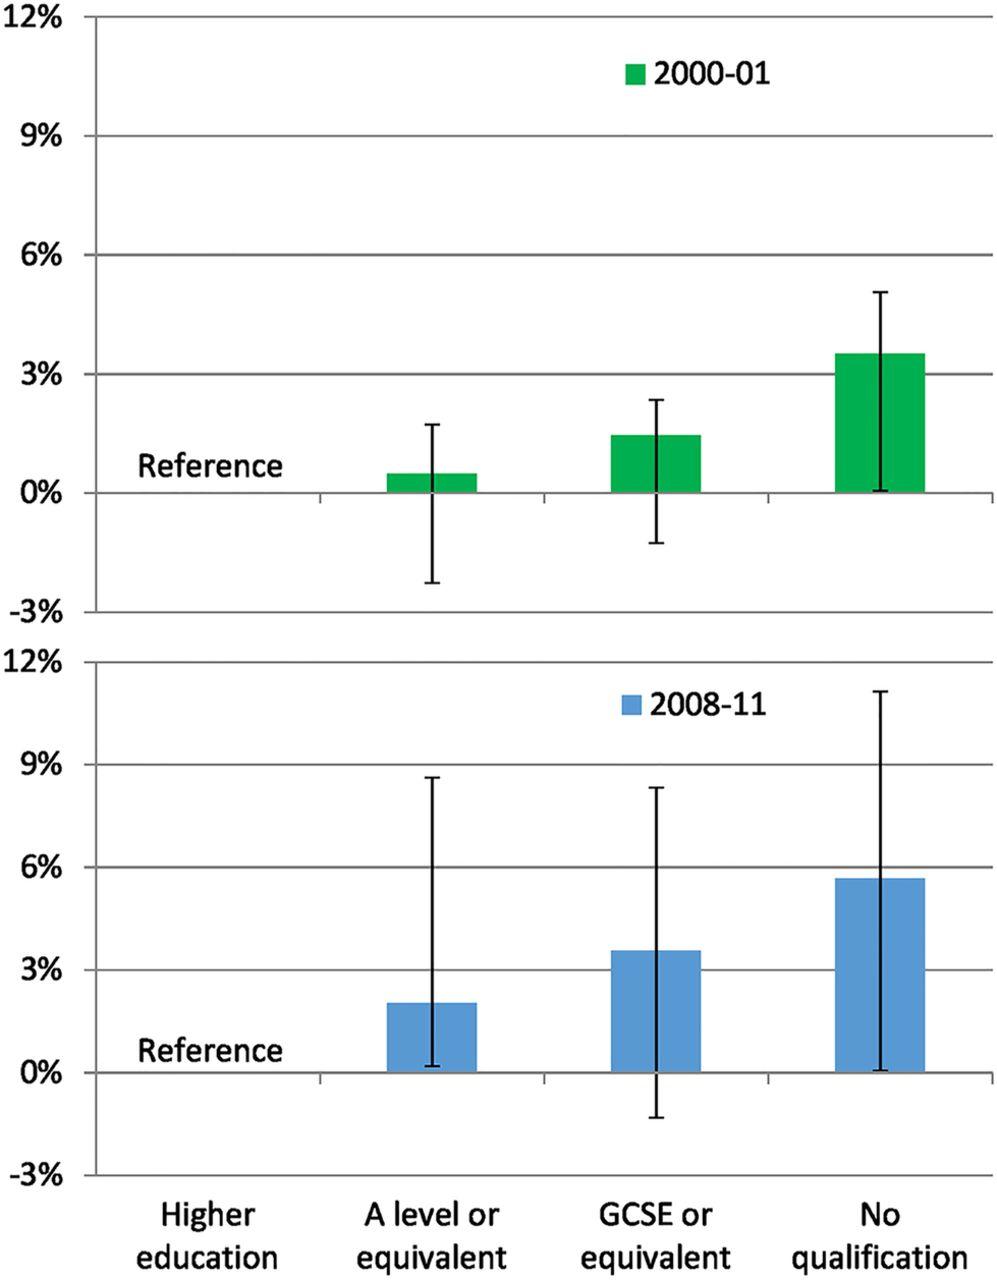 socioeconomic inequality in salt intake in britain 10 years after figure